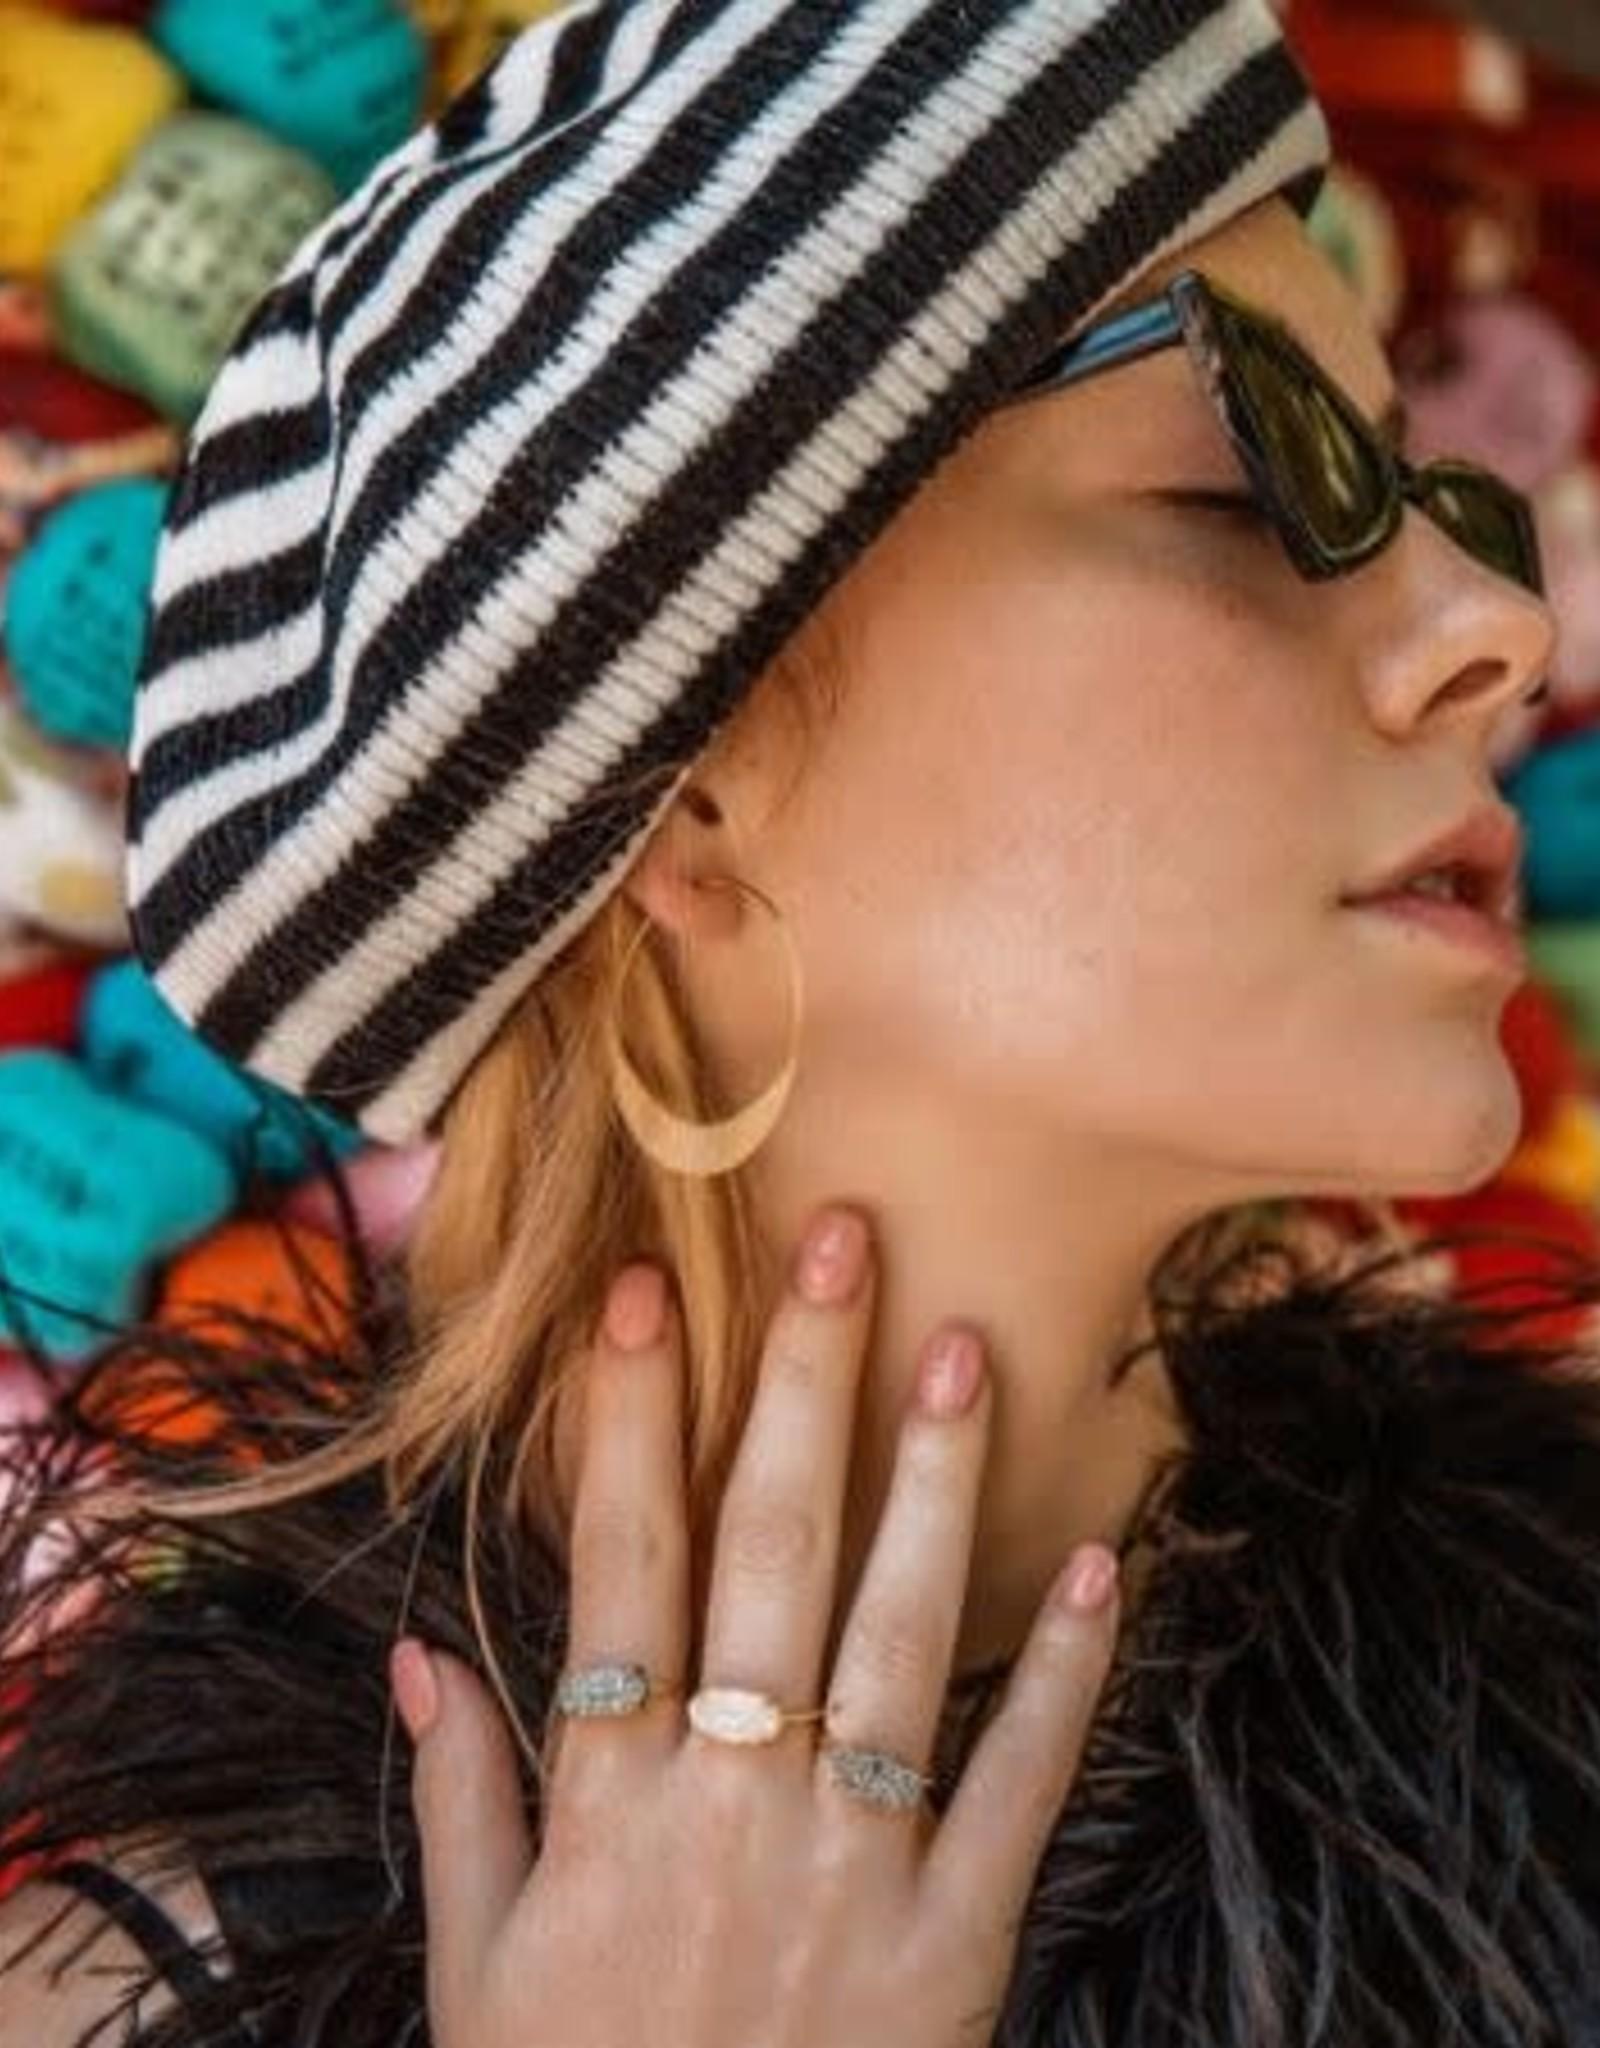 LESLIE FRANCESCA ROUND METAL THIN EARRING